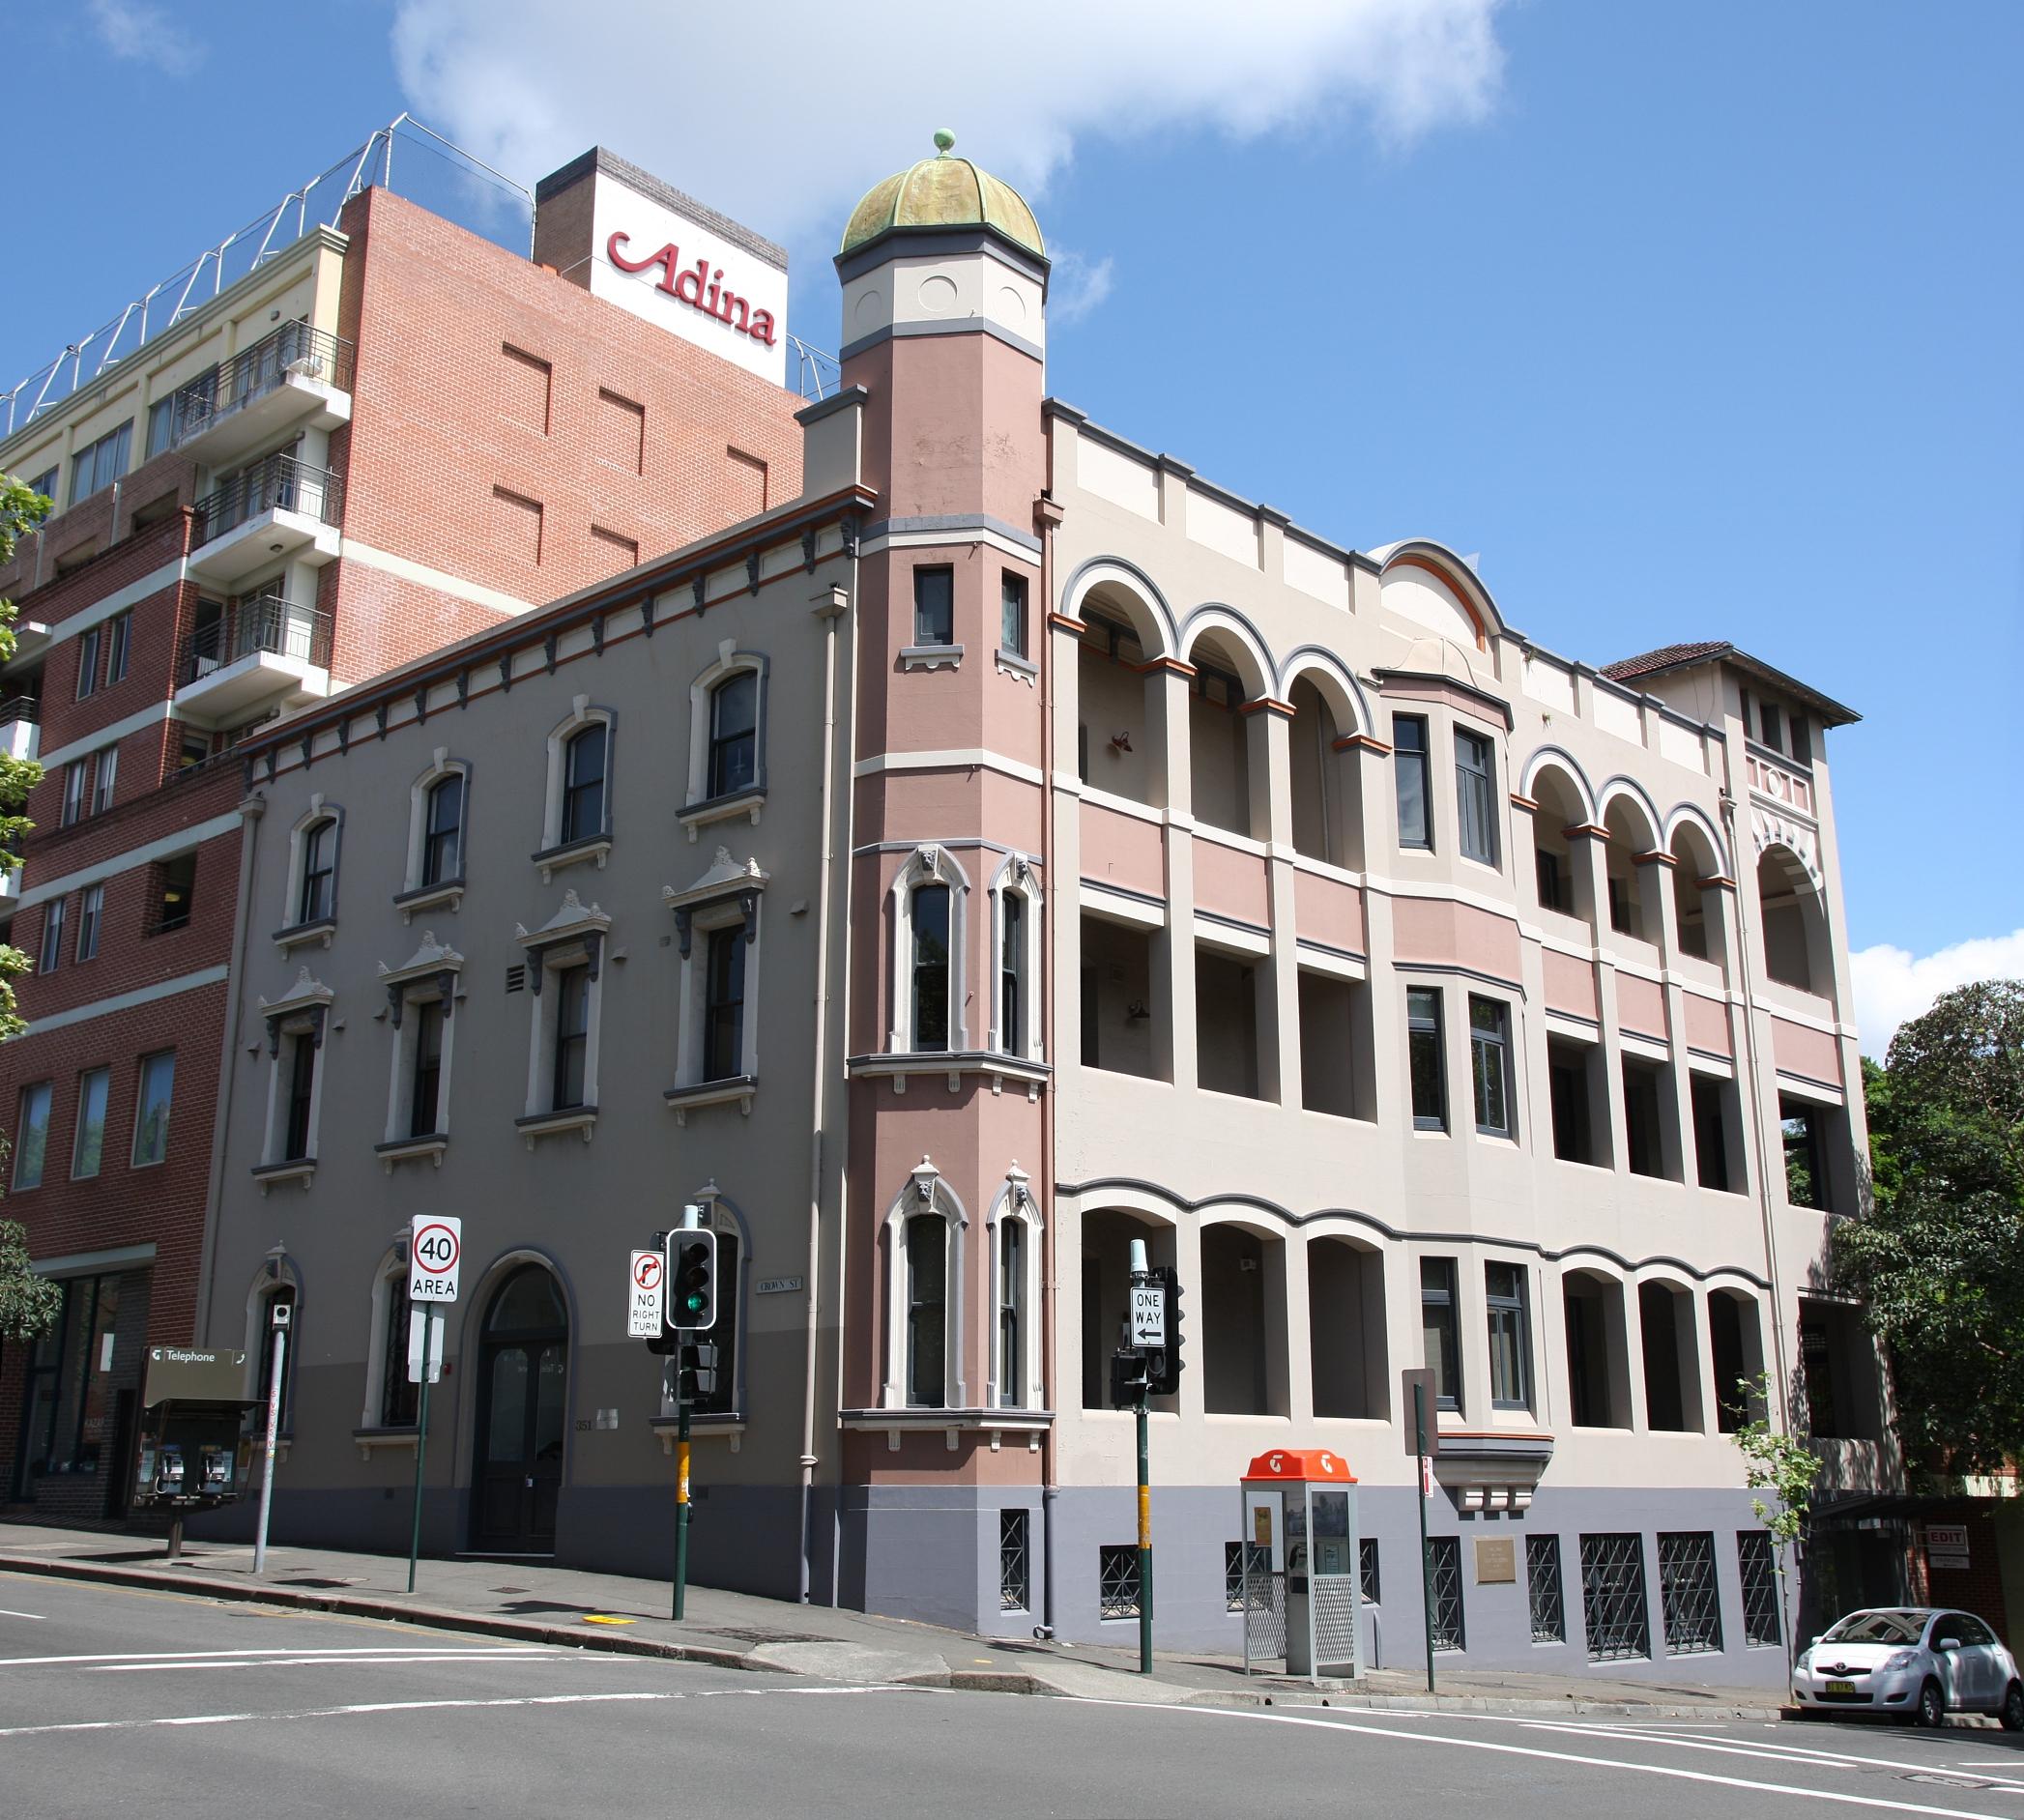 141128 Womens_hospital_albion_street[1]